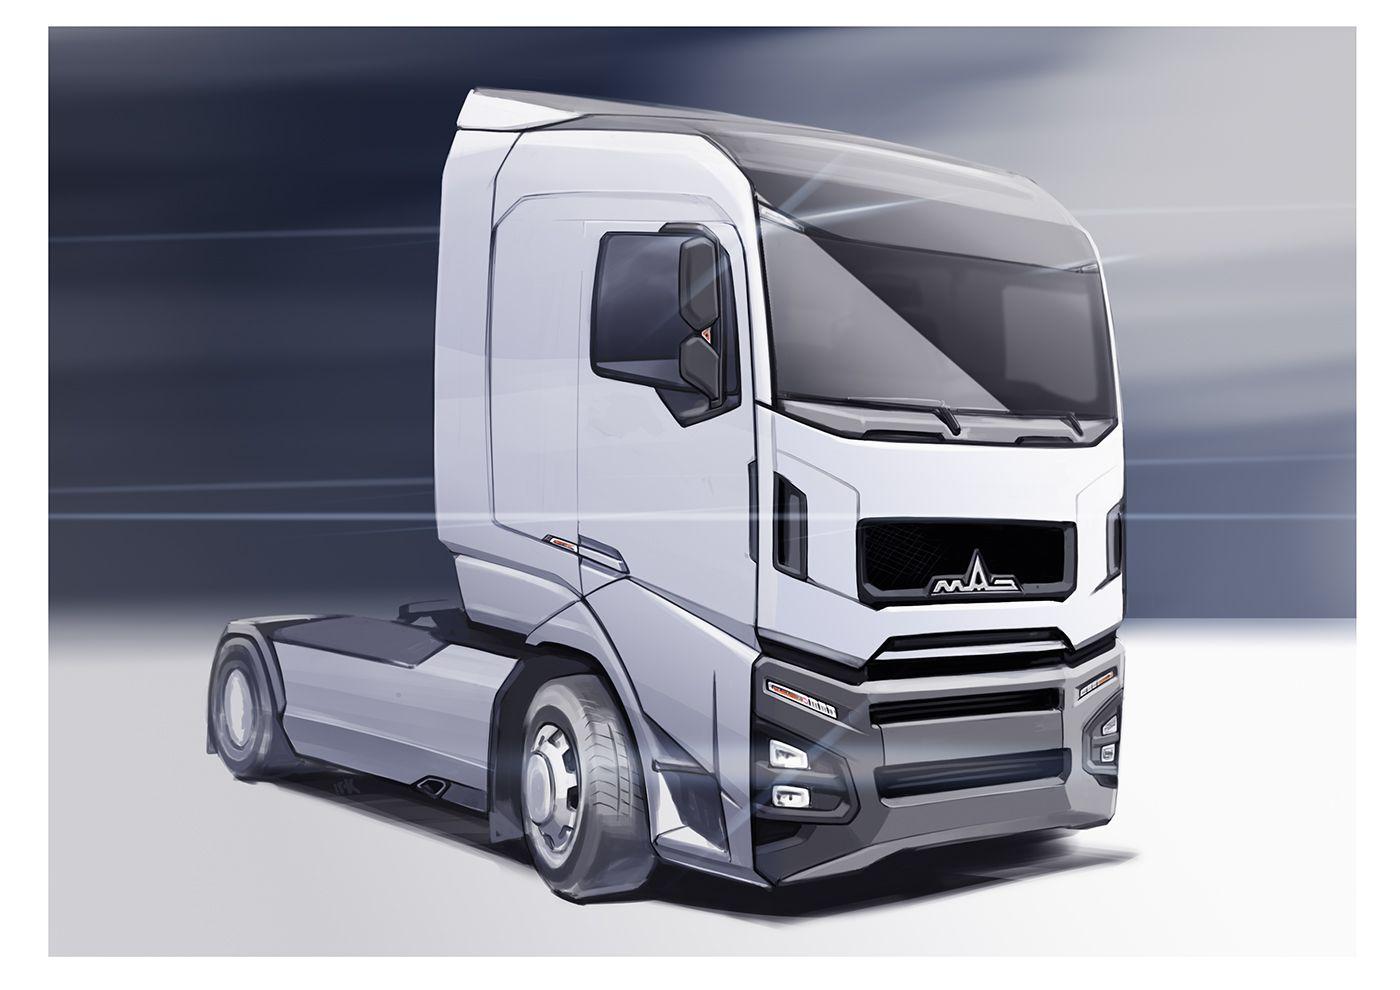 sketch city truck lkw 39 s trucks autos und camiones. Black Bedroom Furniture Sets. Home Design Ideas